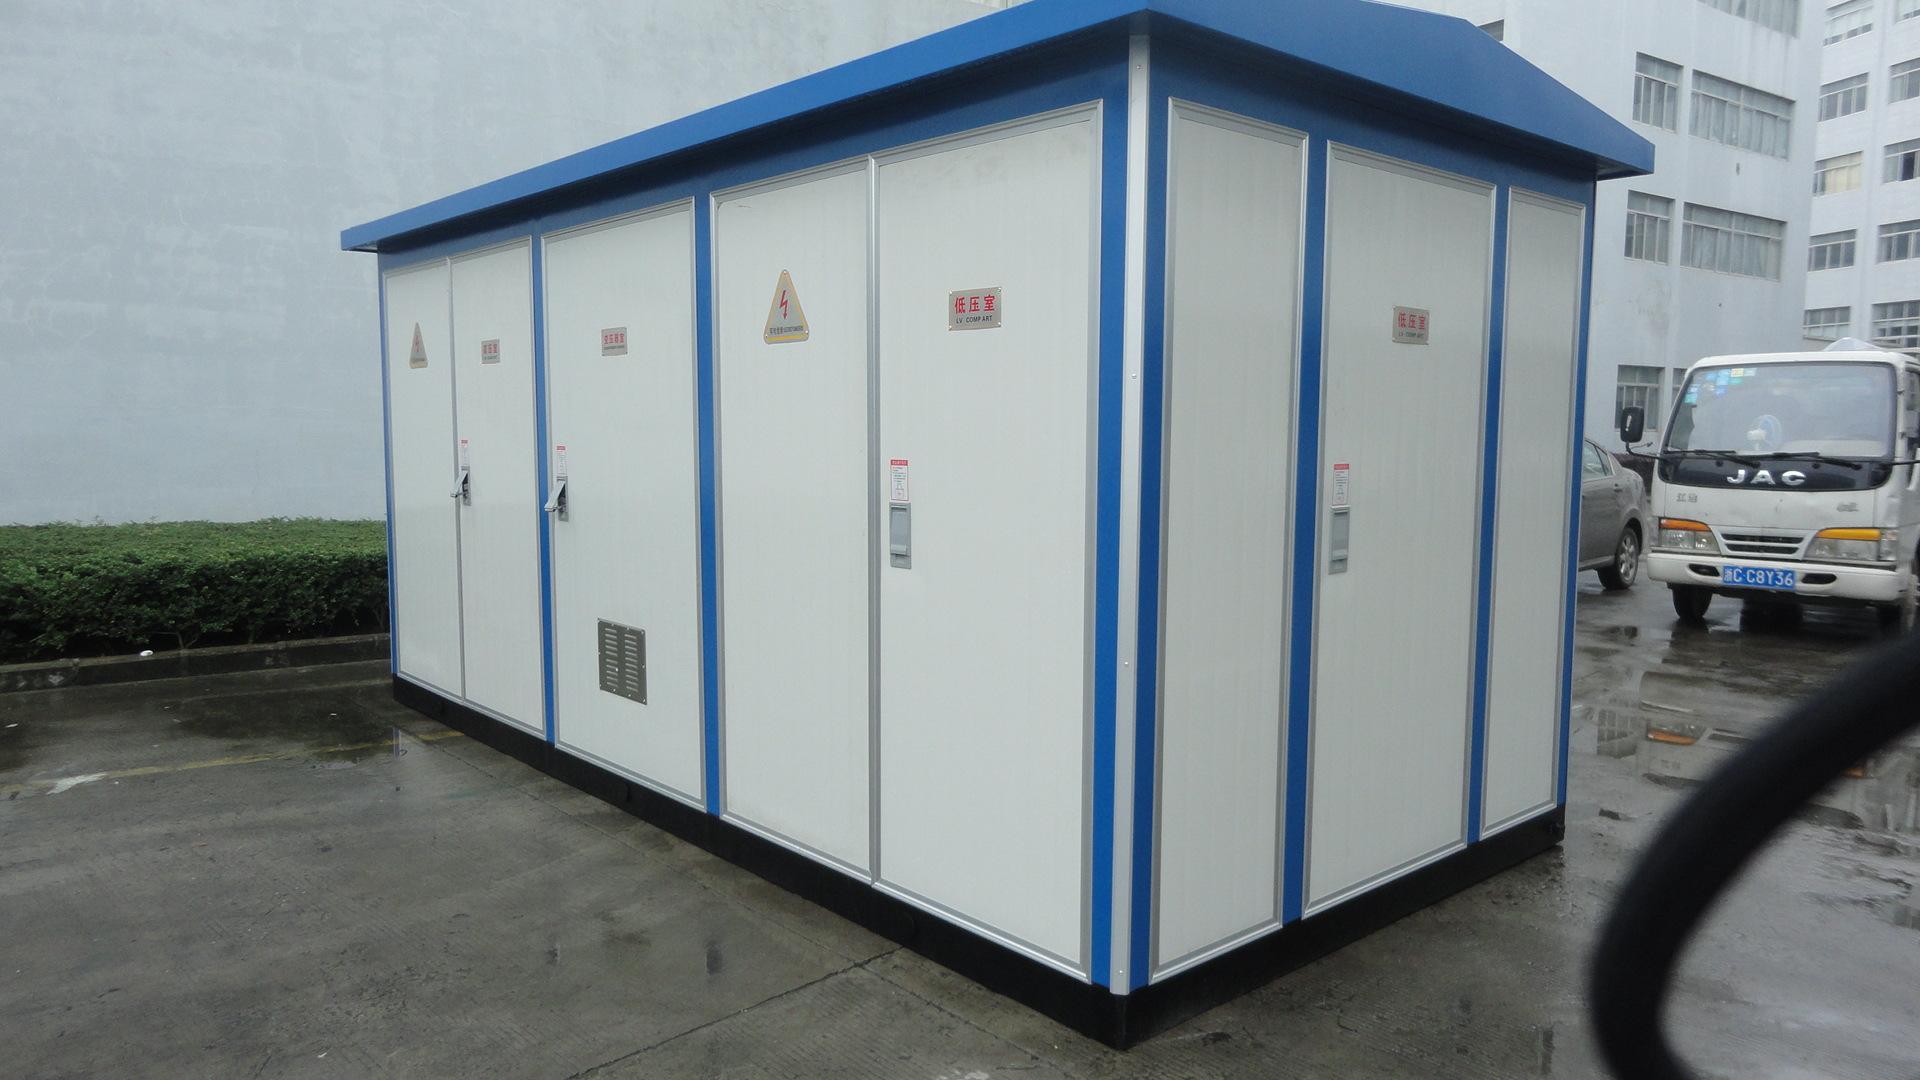 Máy biến áp kiểu hộp 20KVA kiểu hộp trạm biến áp ngoài trời .